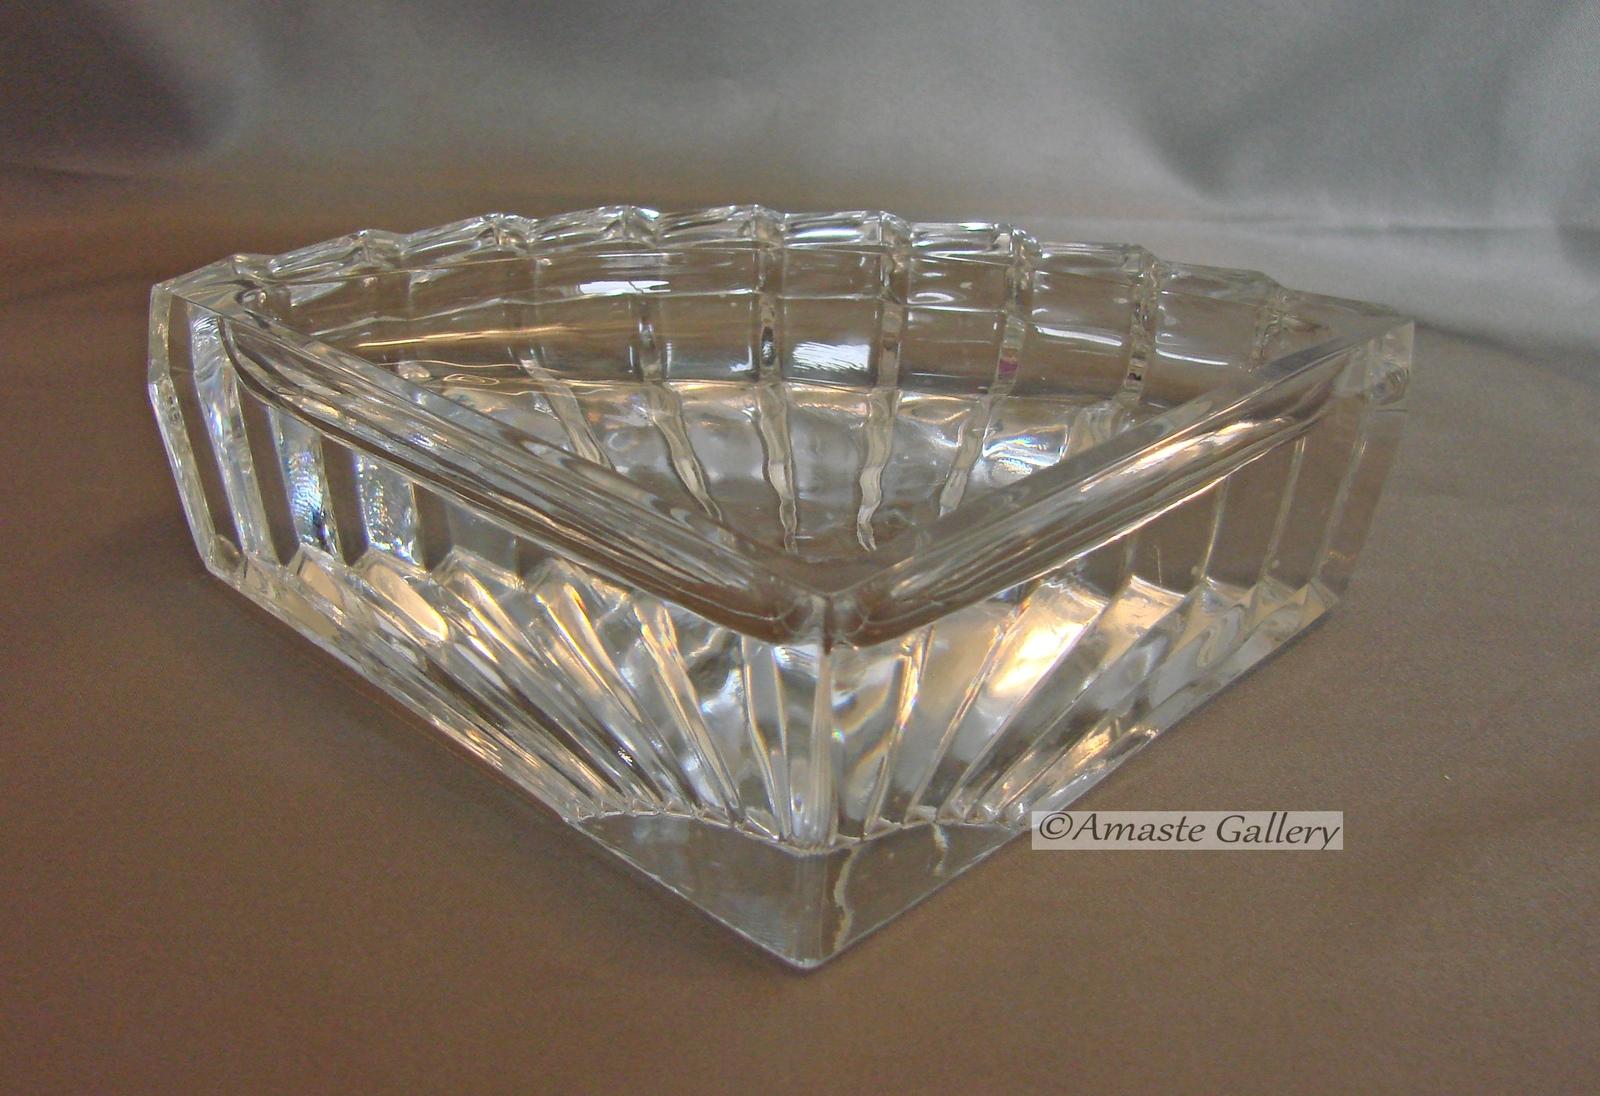 cristal d 39 arques dish 1 listing. Black Bedroom Furniture Sets. Home Design Ideas